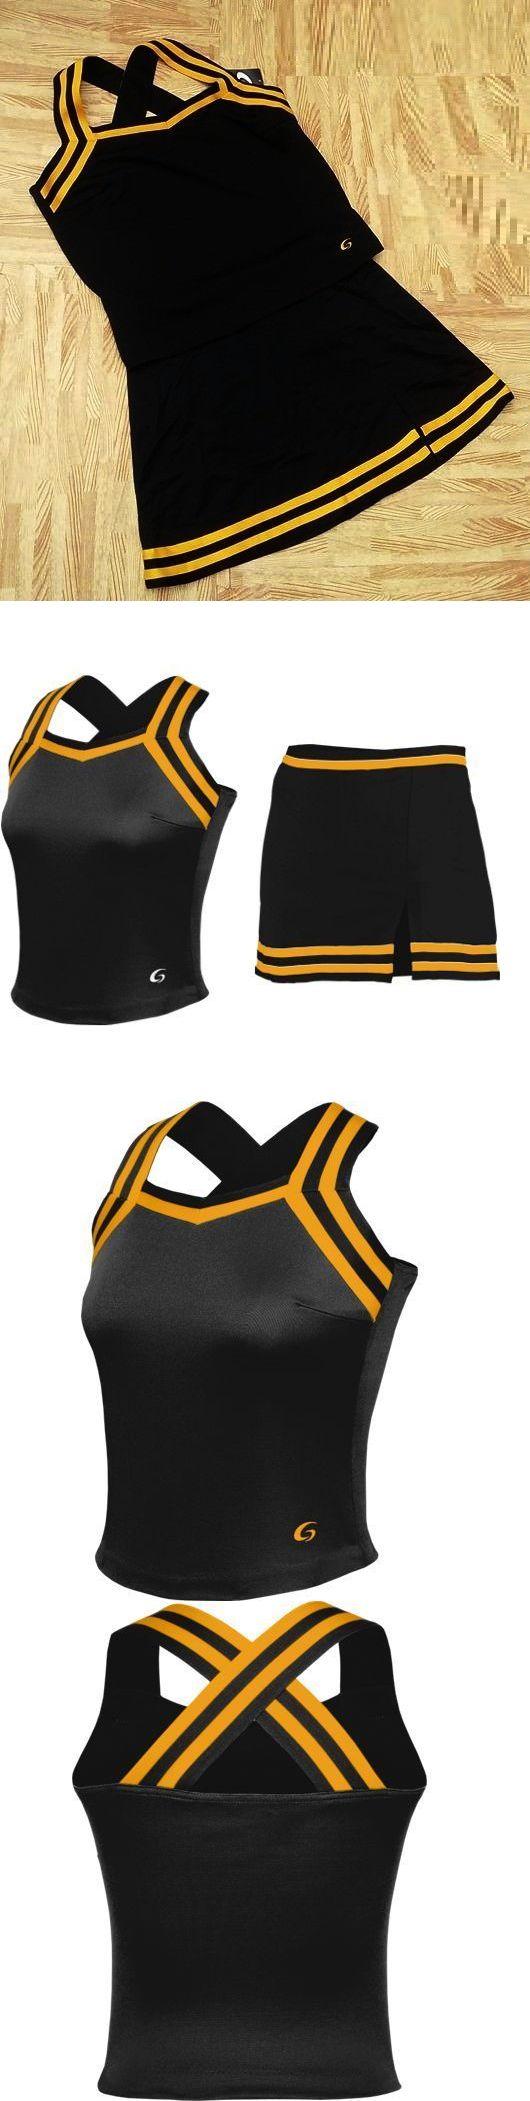 a2f8d5d1079 Cheerleading 66832  Sexy! Adult Xxl 2Xl Black Cheerleader Uniform Criss  Cross Top Skirt 44-46 36-38 -  BUY IT NOW ONLY   39.99 on eBay!